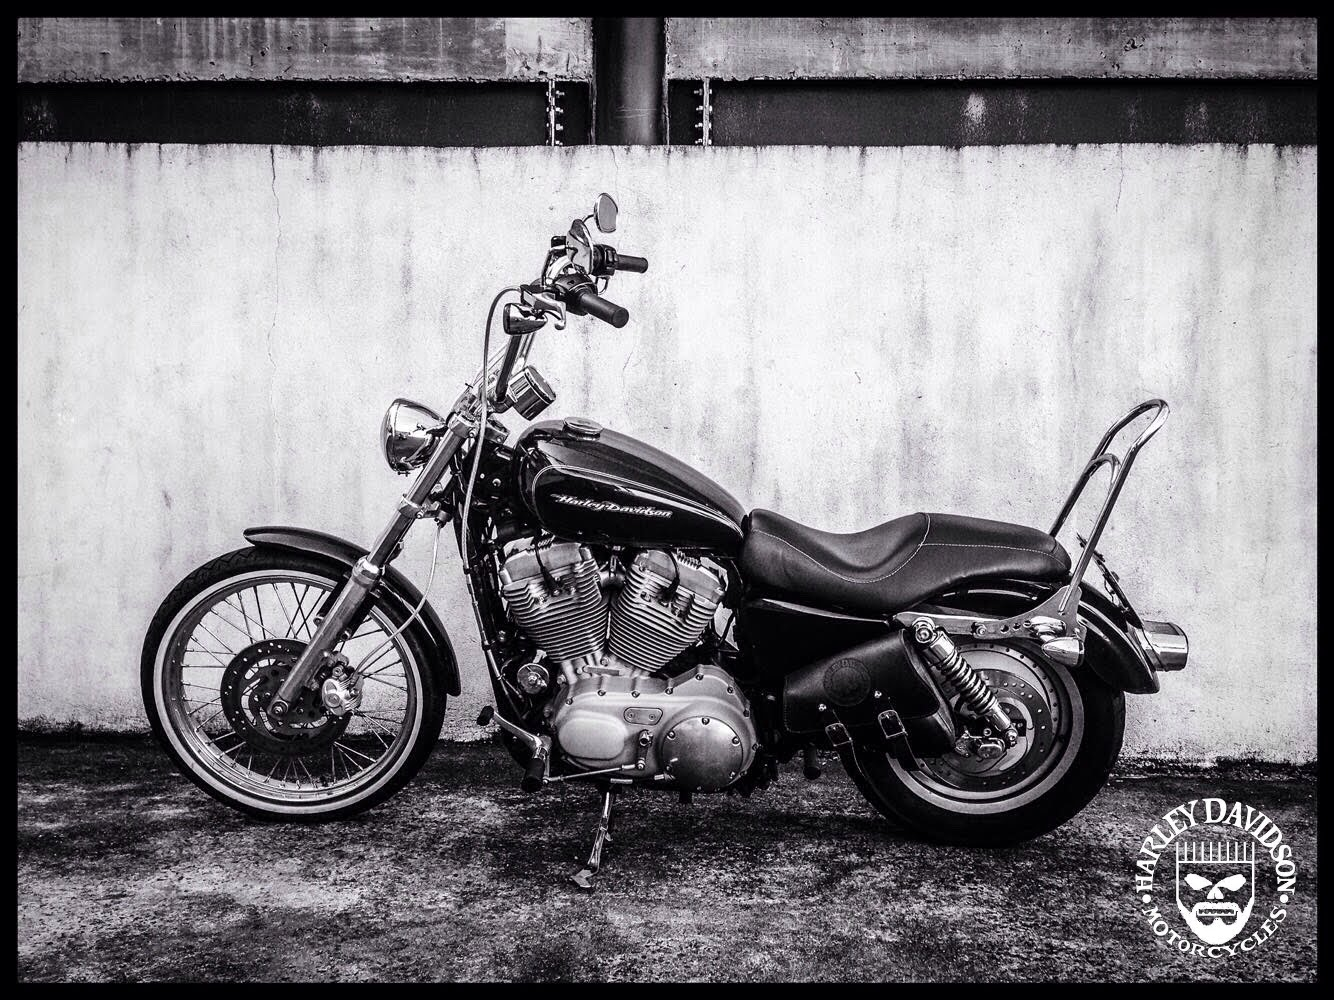 Minha moto atual: